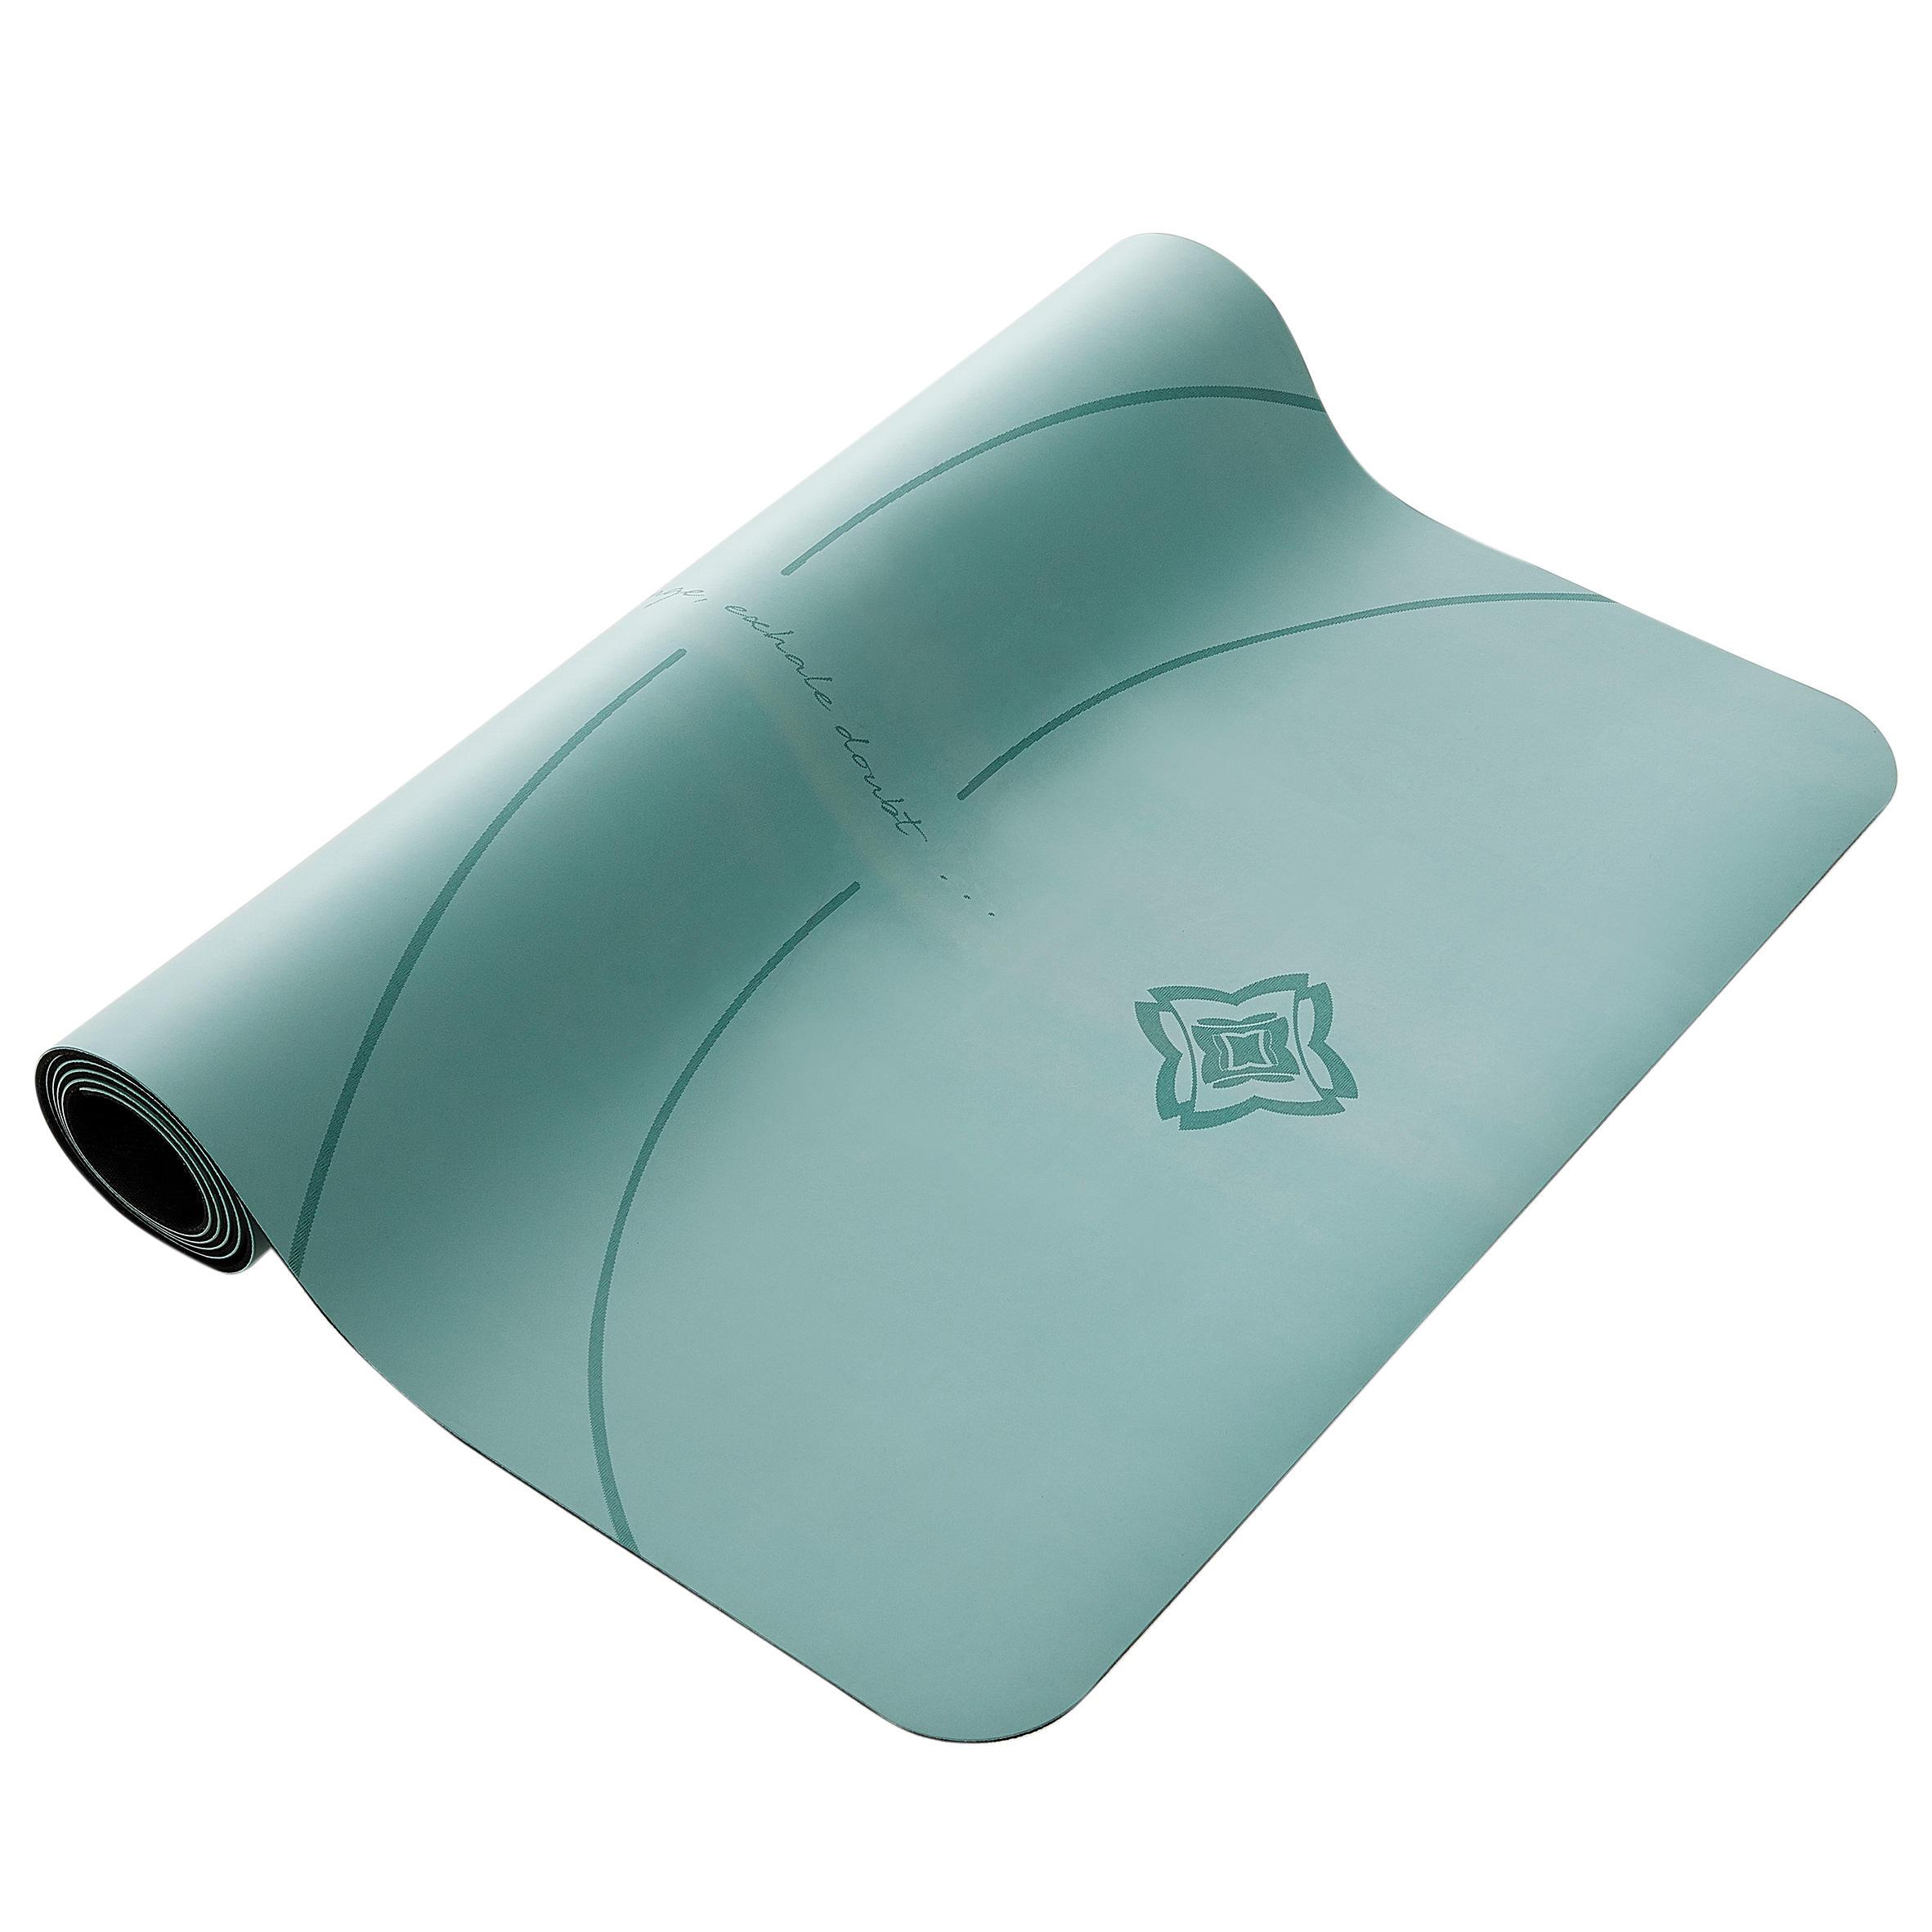 Saltea Yoga Grip + 3mm Verde la Reducere poza